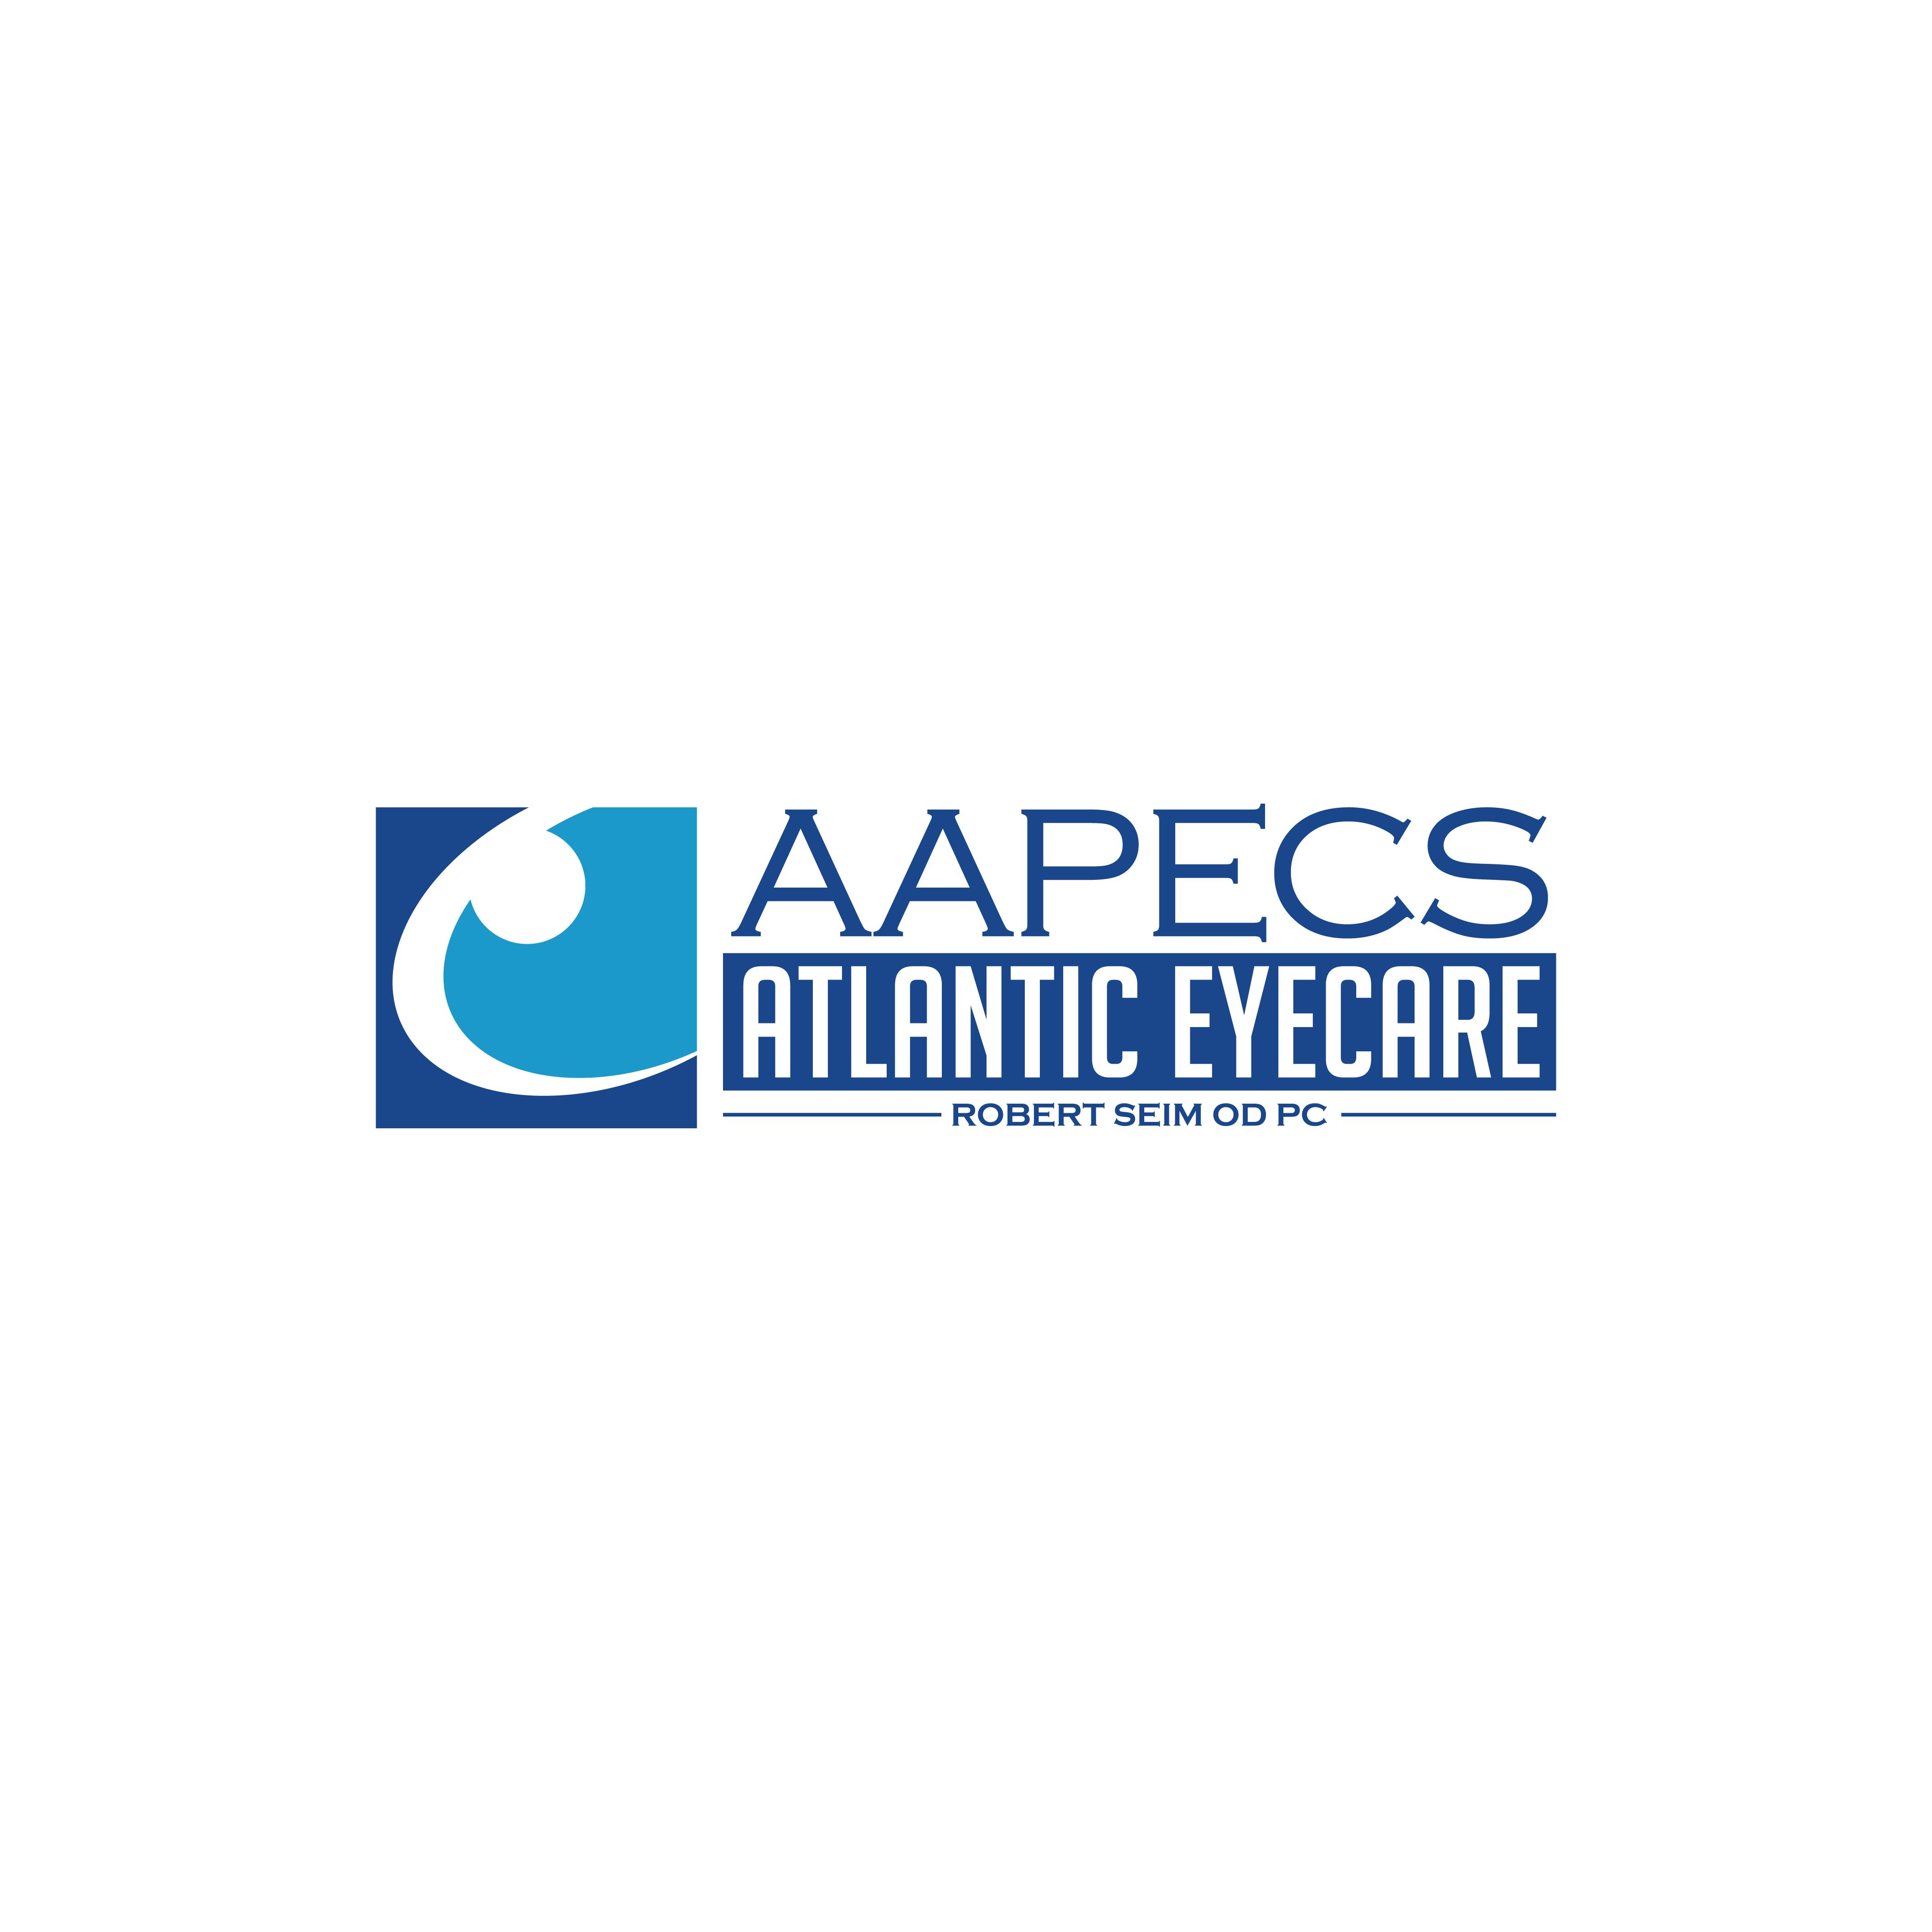 AAPECS Atlantic EyeCare - Virginia Beach, VA 23452 - (757)340-7070 | ShowMeLocal.com